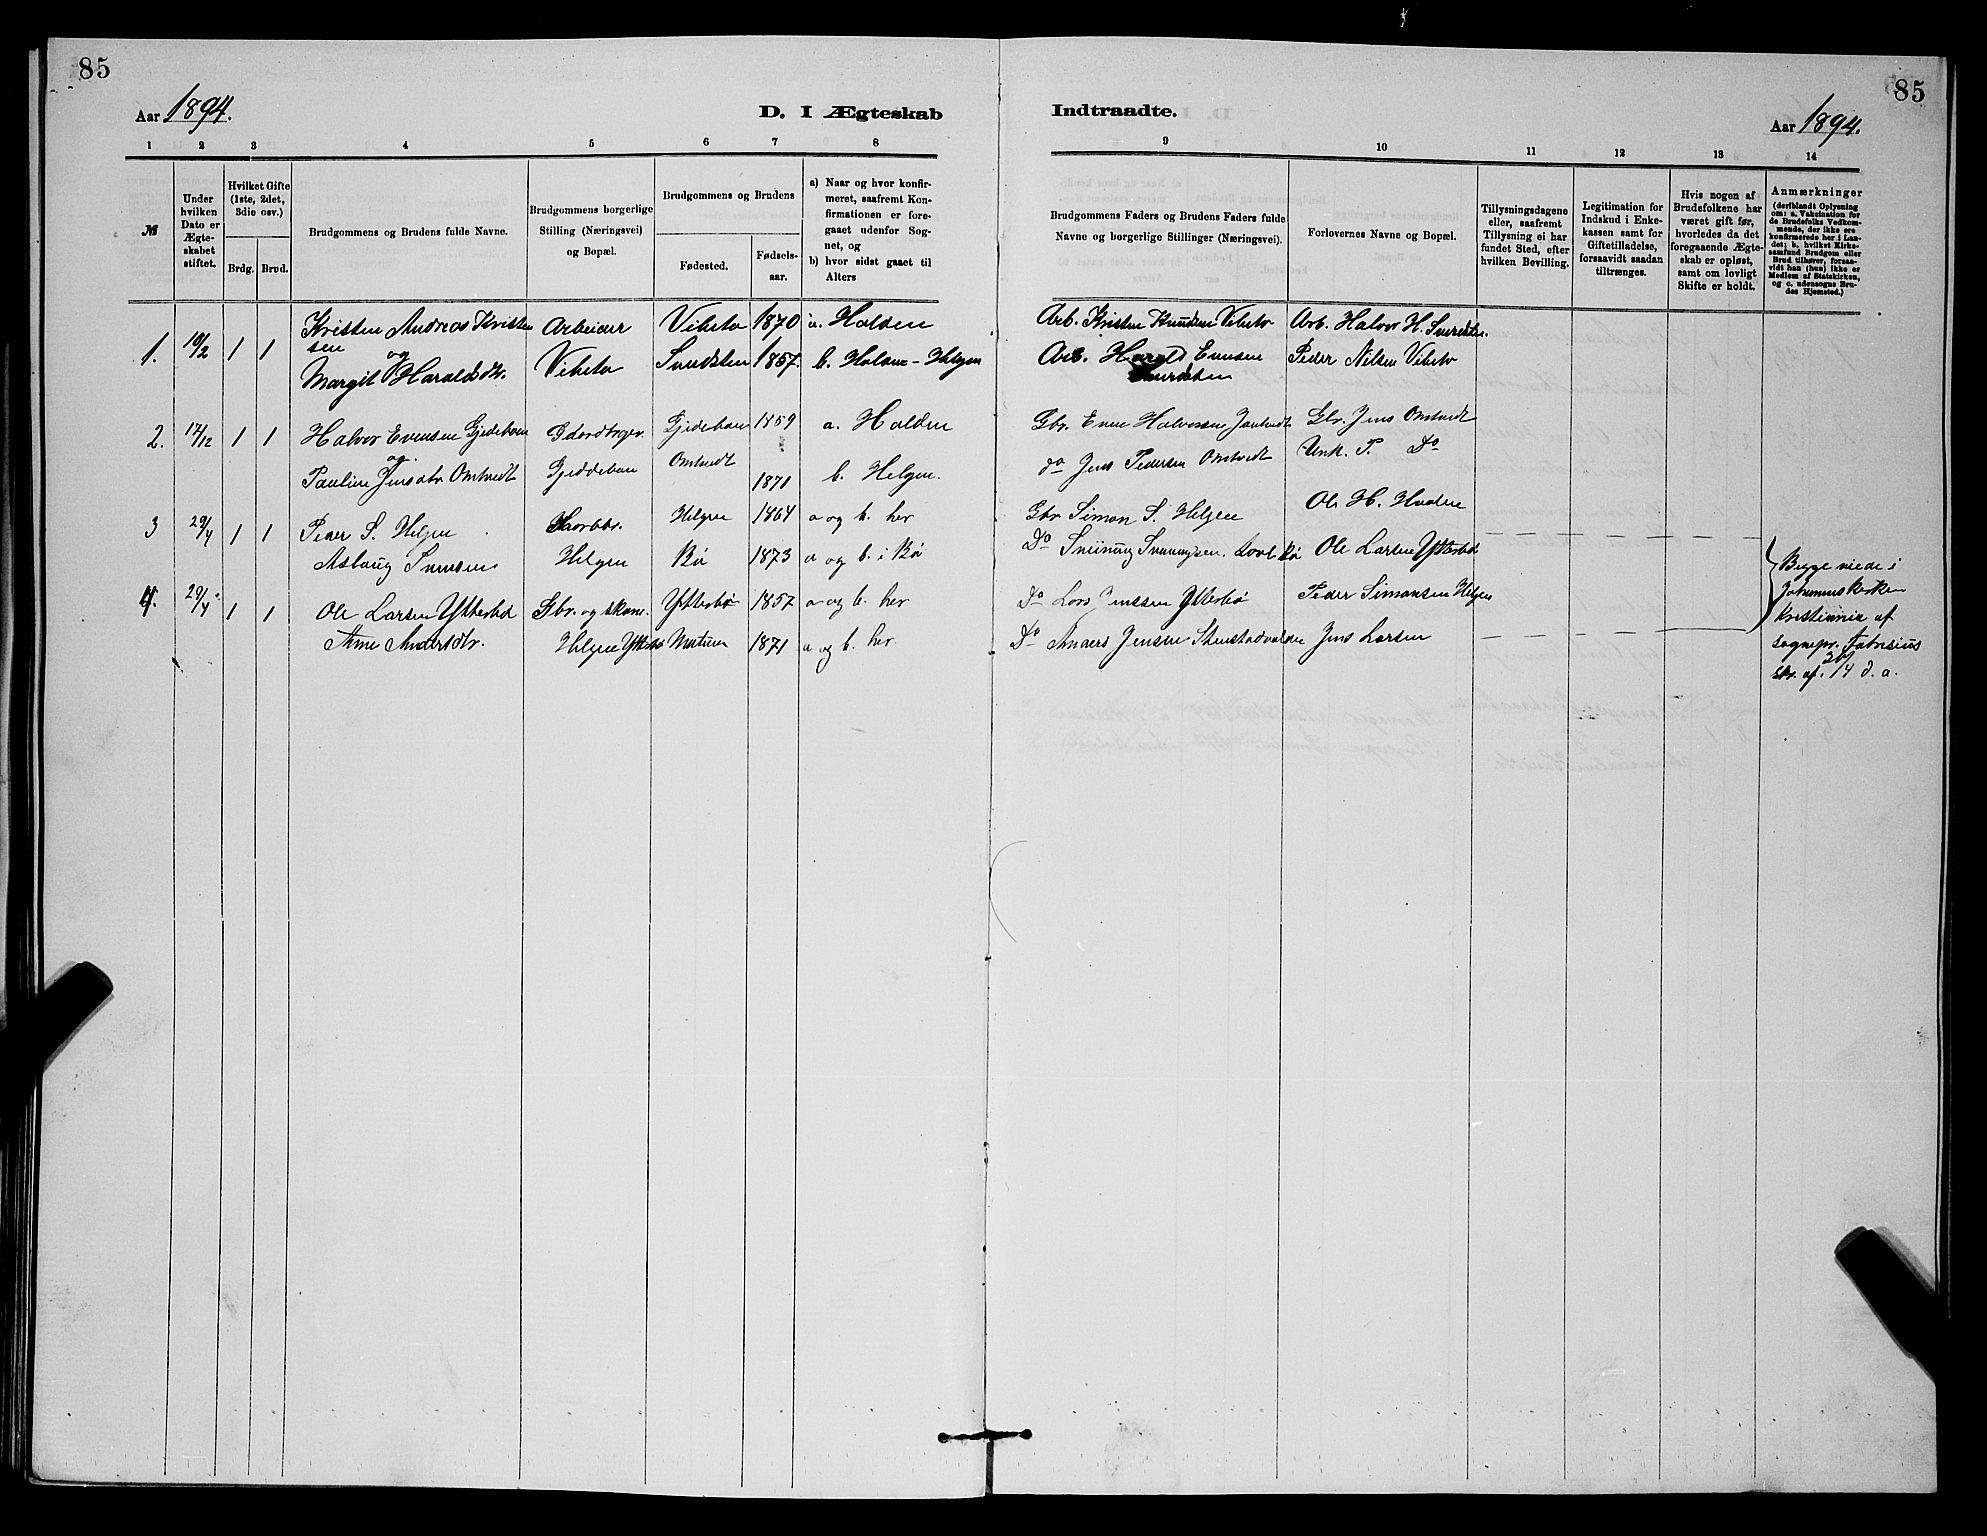 SAKO, Holla kirkebøker, G/Gb/L0001: Klokkerbok nr. II 1, 1882-1897, s. 85